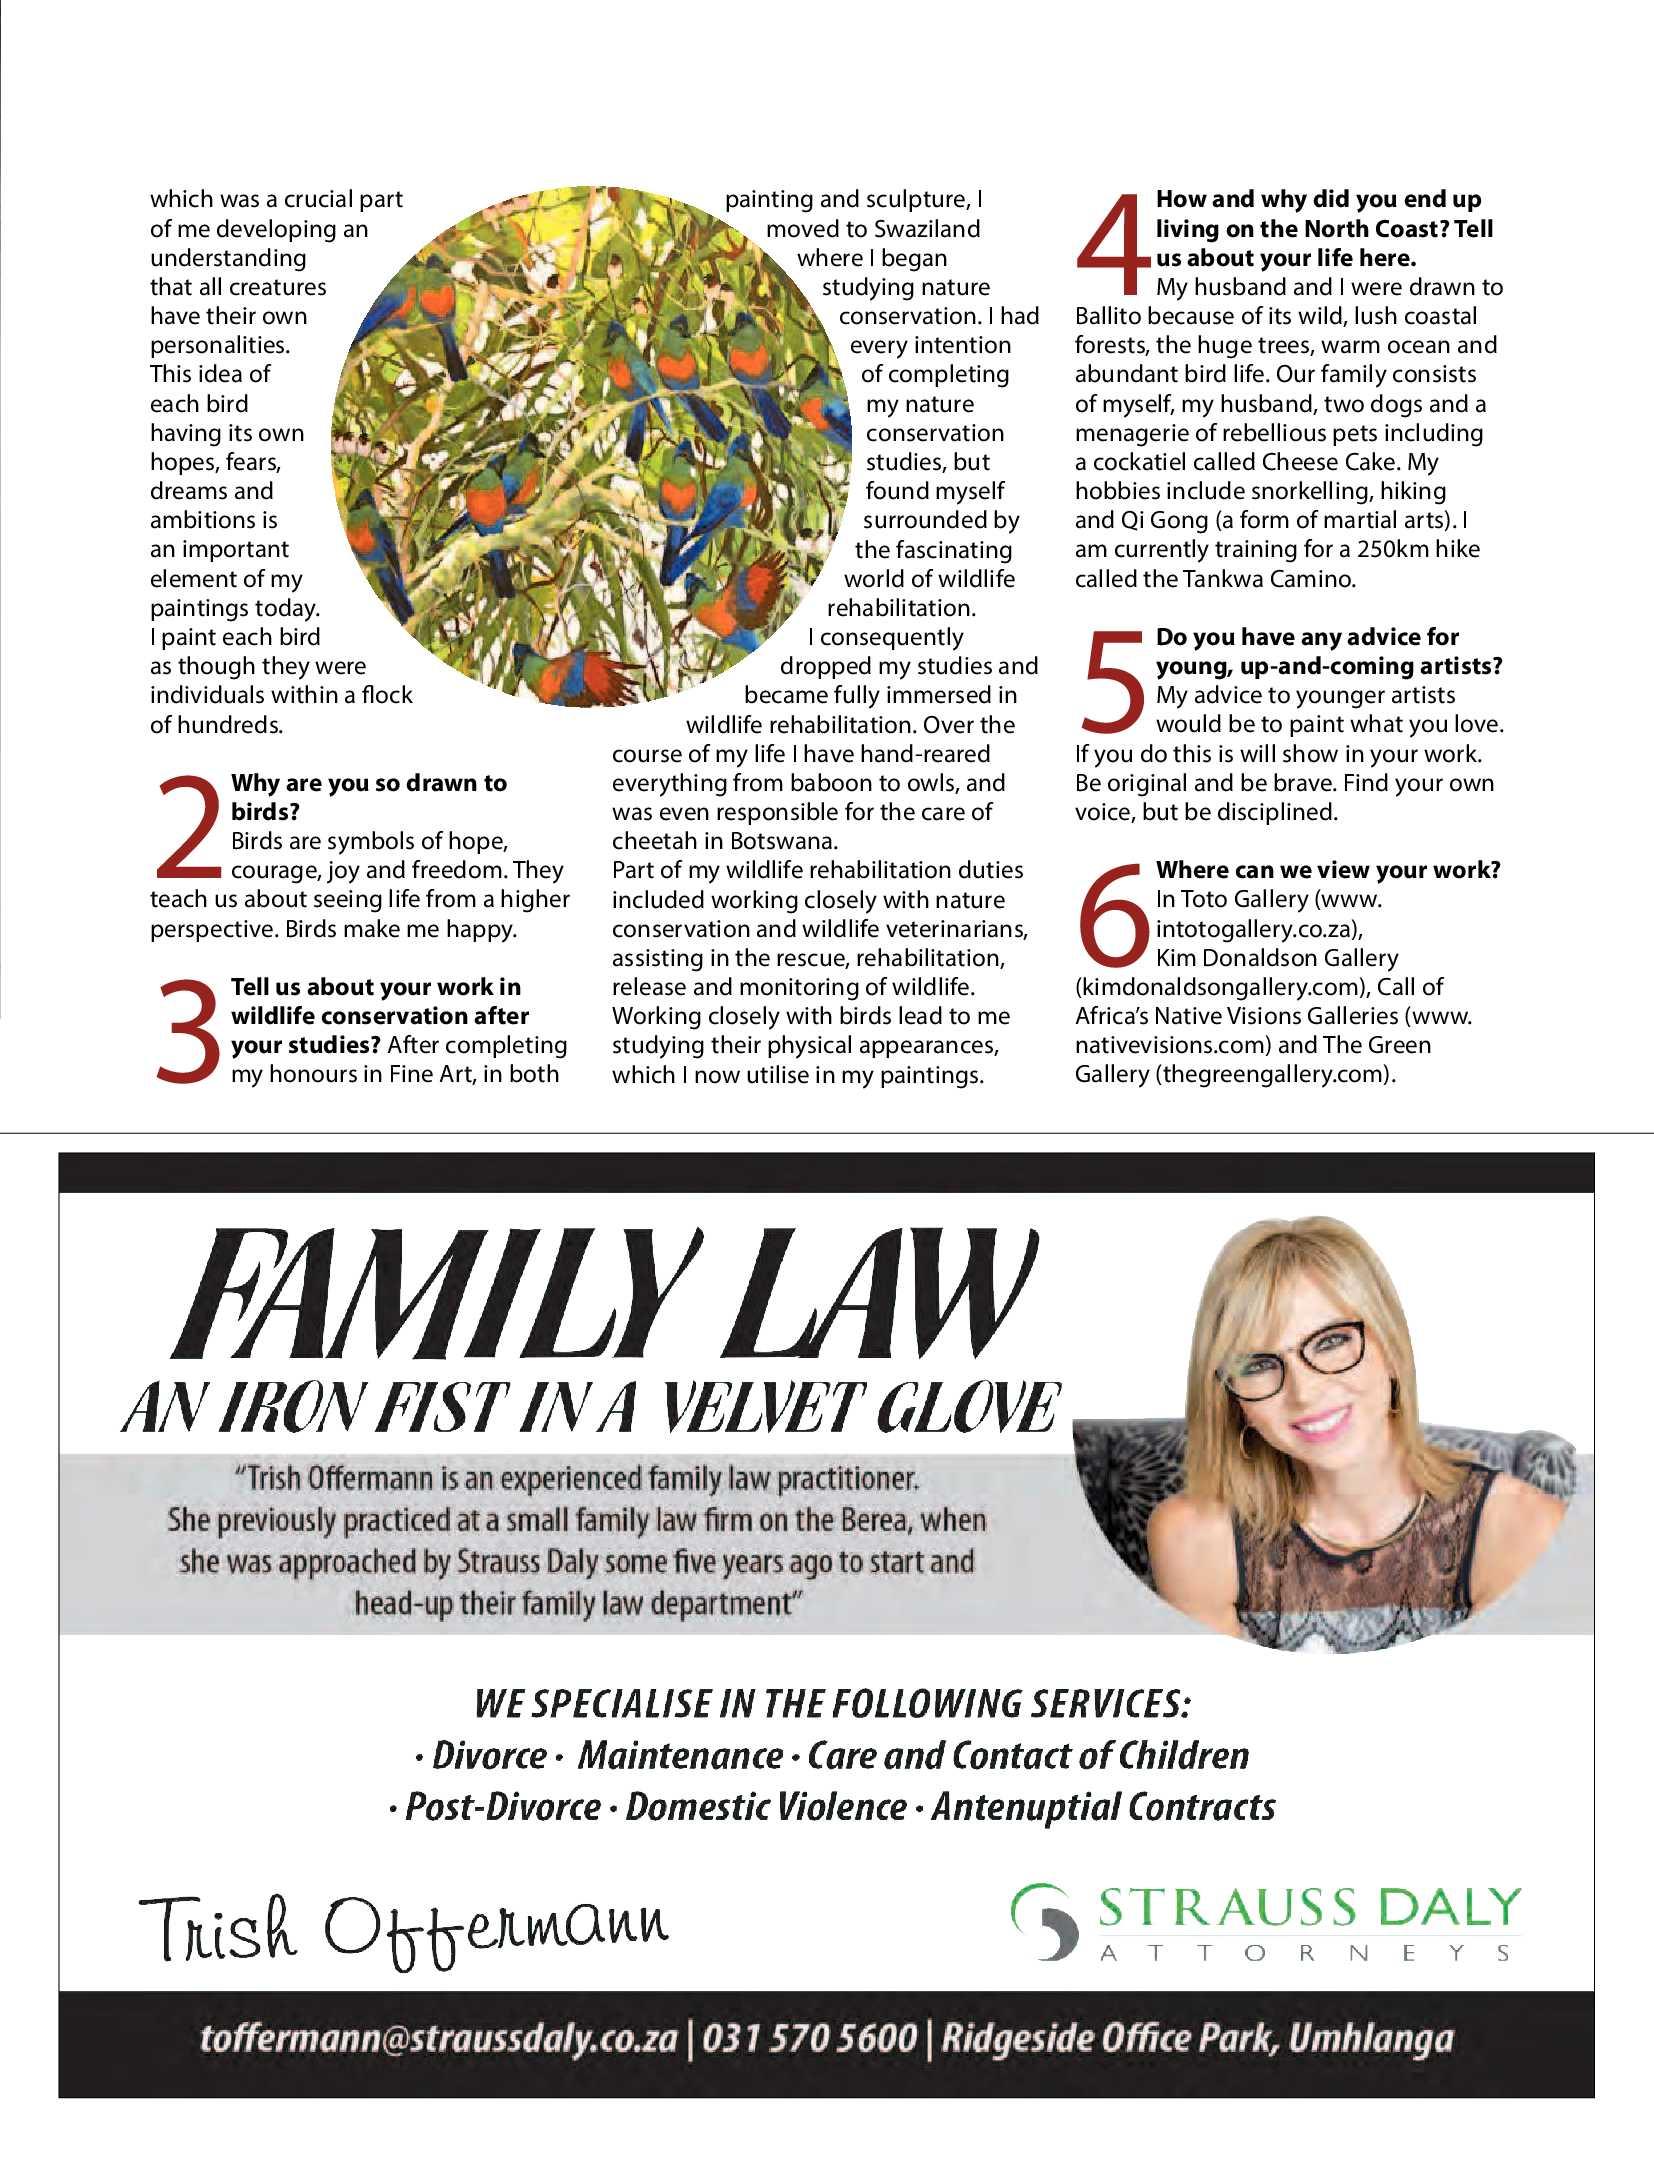 get-magazine-ballitoumhlanga-november-2017-2-epapers-page-27